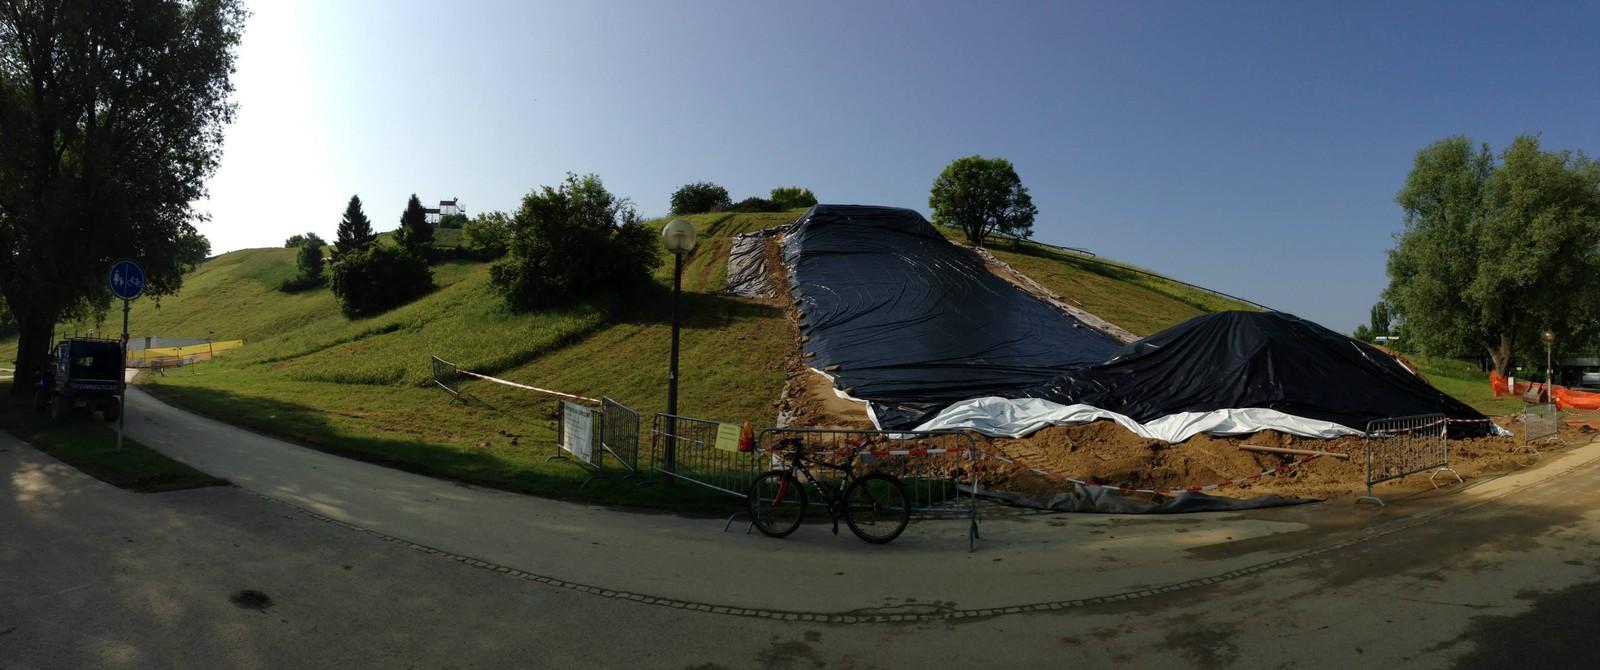 X-Games Munich Slopestyle Course Build - All Things X-Games Munich Slopestyle - Mountain Biking Pictures - Vital MTB